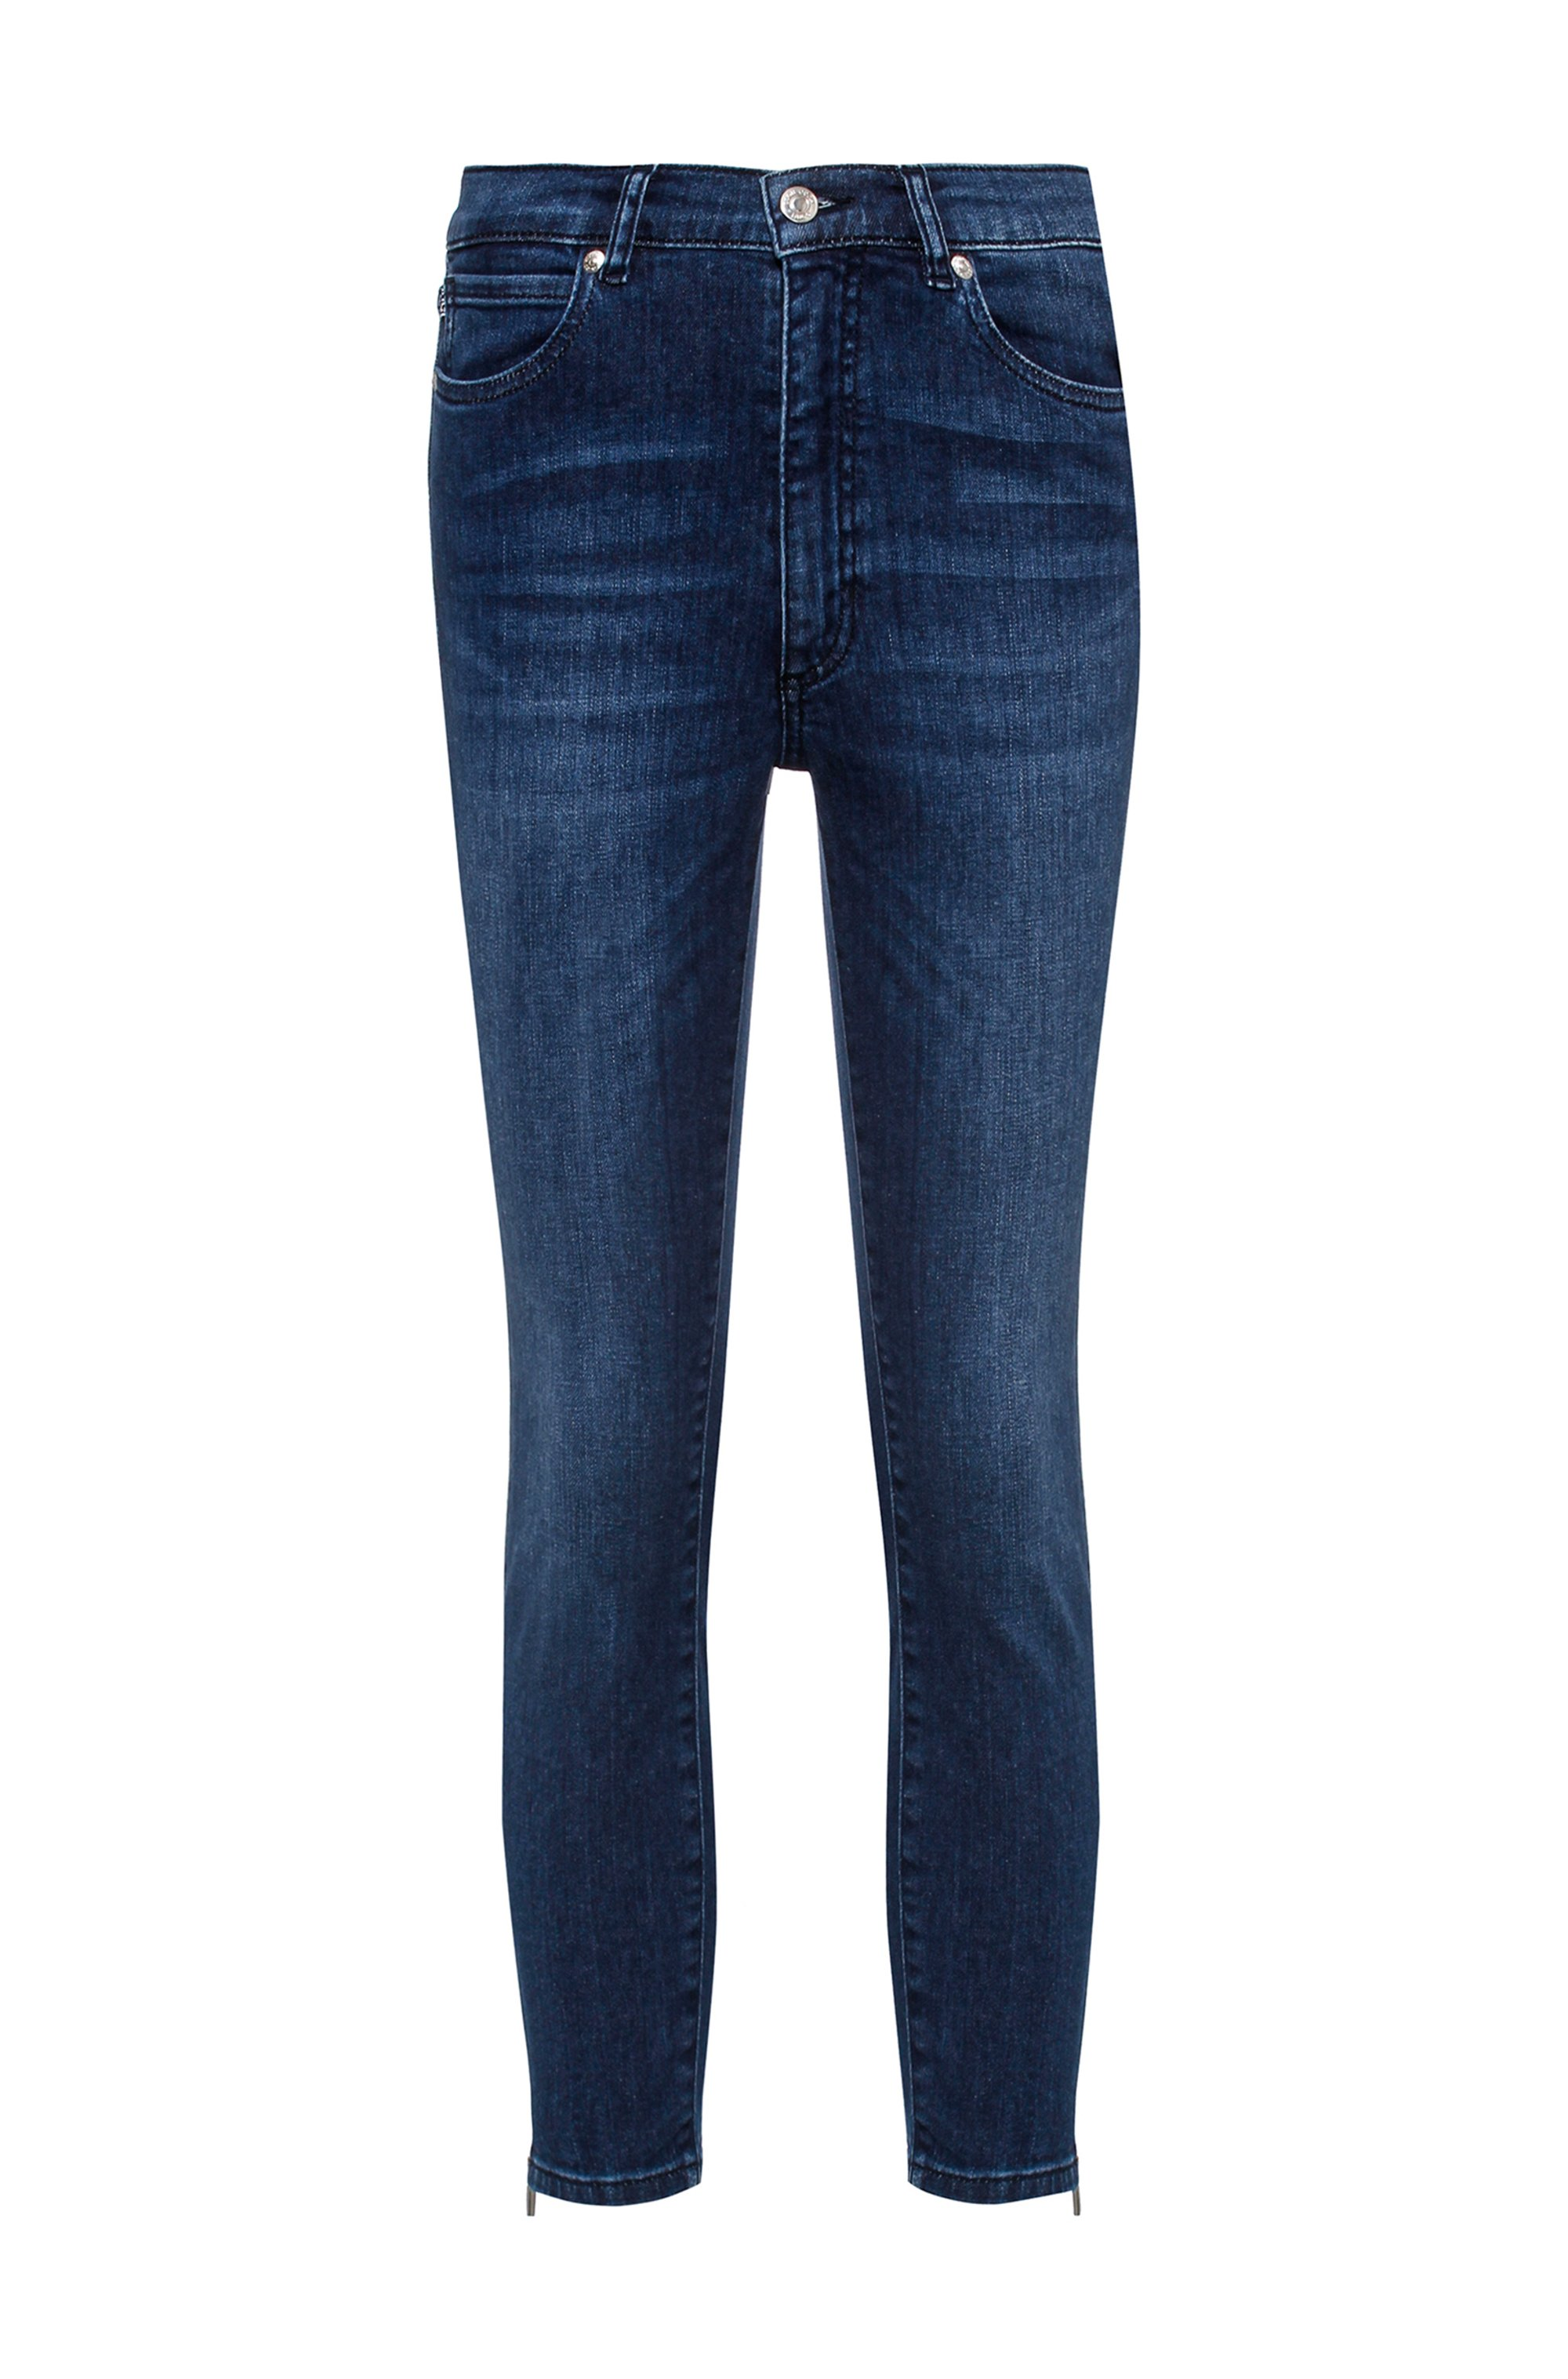 LOU Skinny-Fit Jeans aus Stretch-Denim mit Reißverschlüssen am Saum, Blau